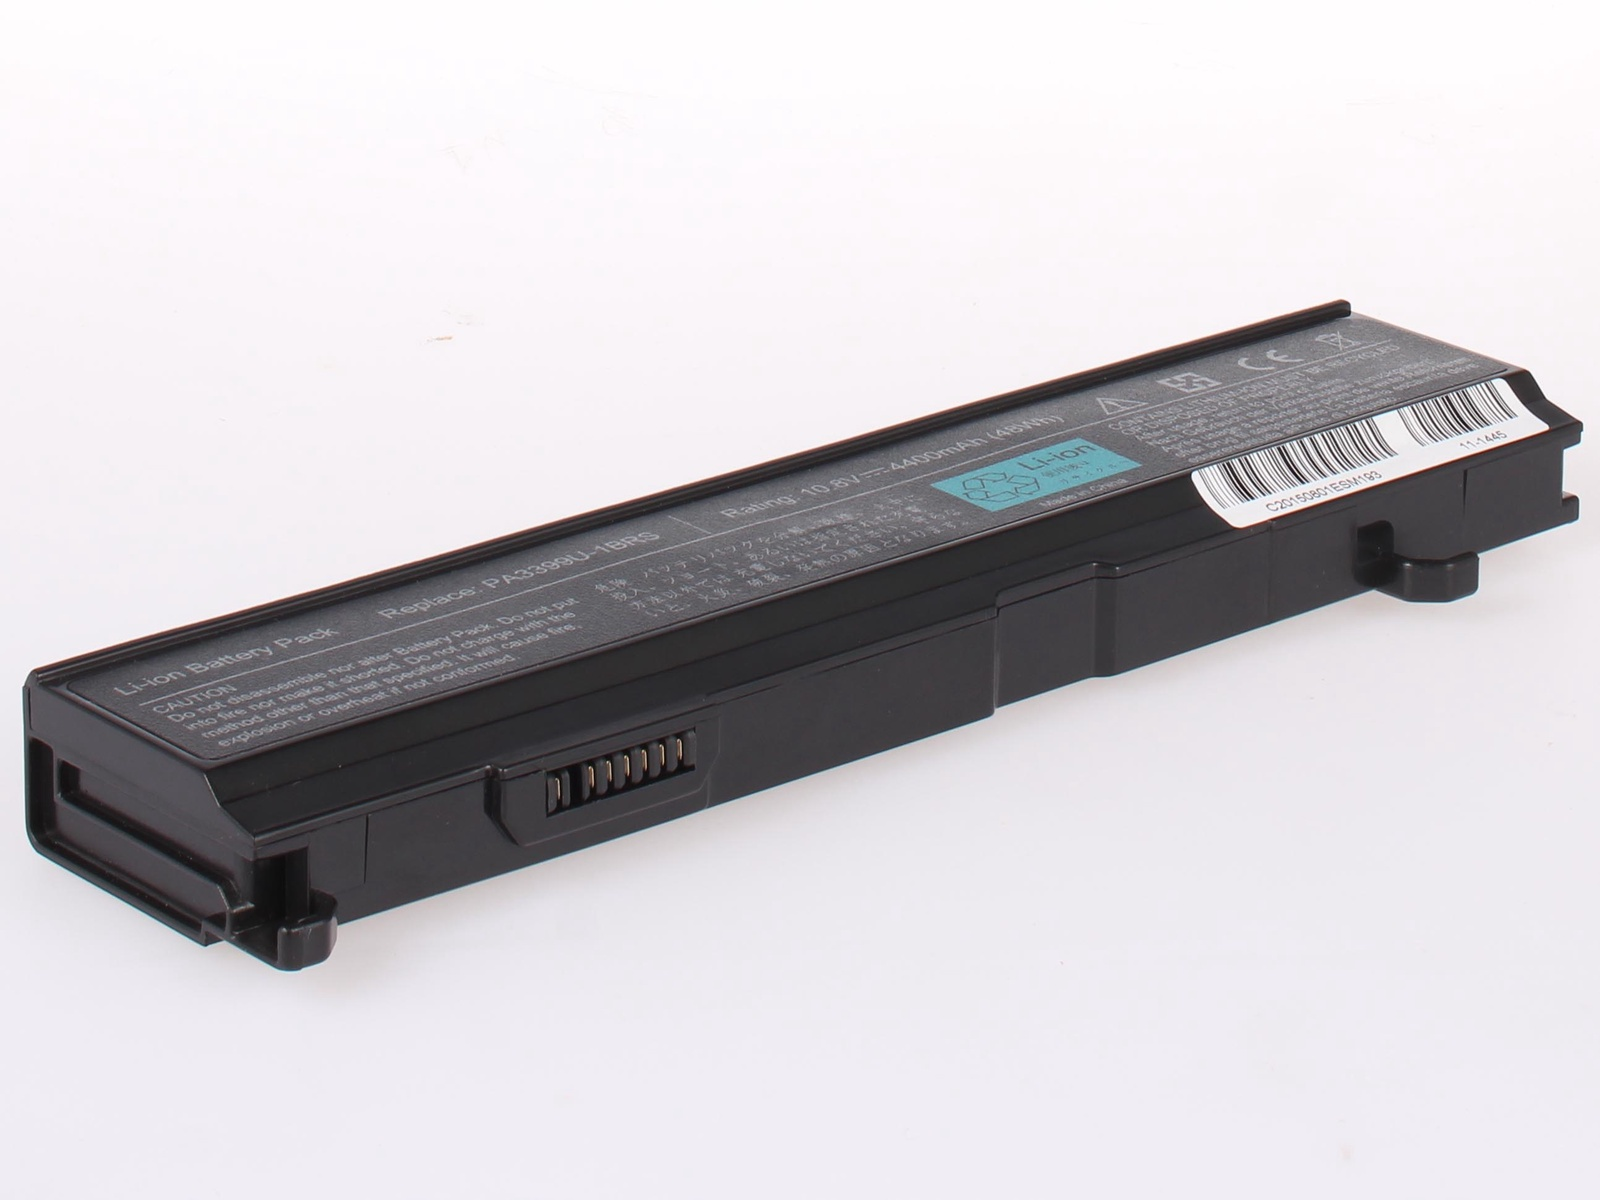 Аккумулятор для ноутбука AnyBatt для ToshiBa Satellite A105-S4134, Satellite A80-127, Satellite A80-129, Satellite M70-191, Satellite A100-780, Satellite A100-813, Satellite A105-S4184, Satellite M105-S3004, Satellite M45-S351 аккумулятор 4parts lpb m70 для asus f70 g71 g72 m70 n70 n90 pro70 x71 x72 series 11 1v 4400mah